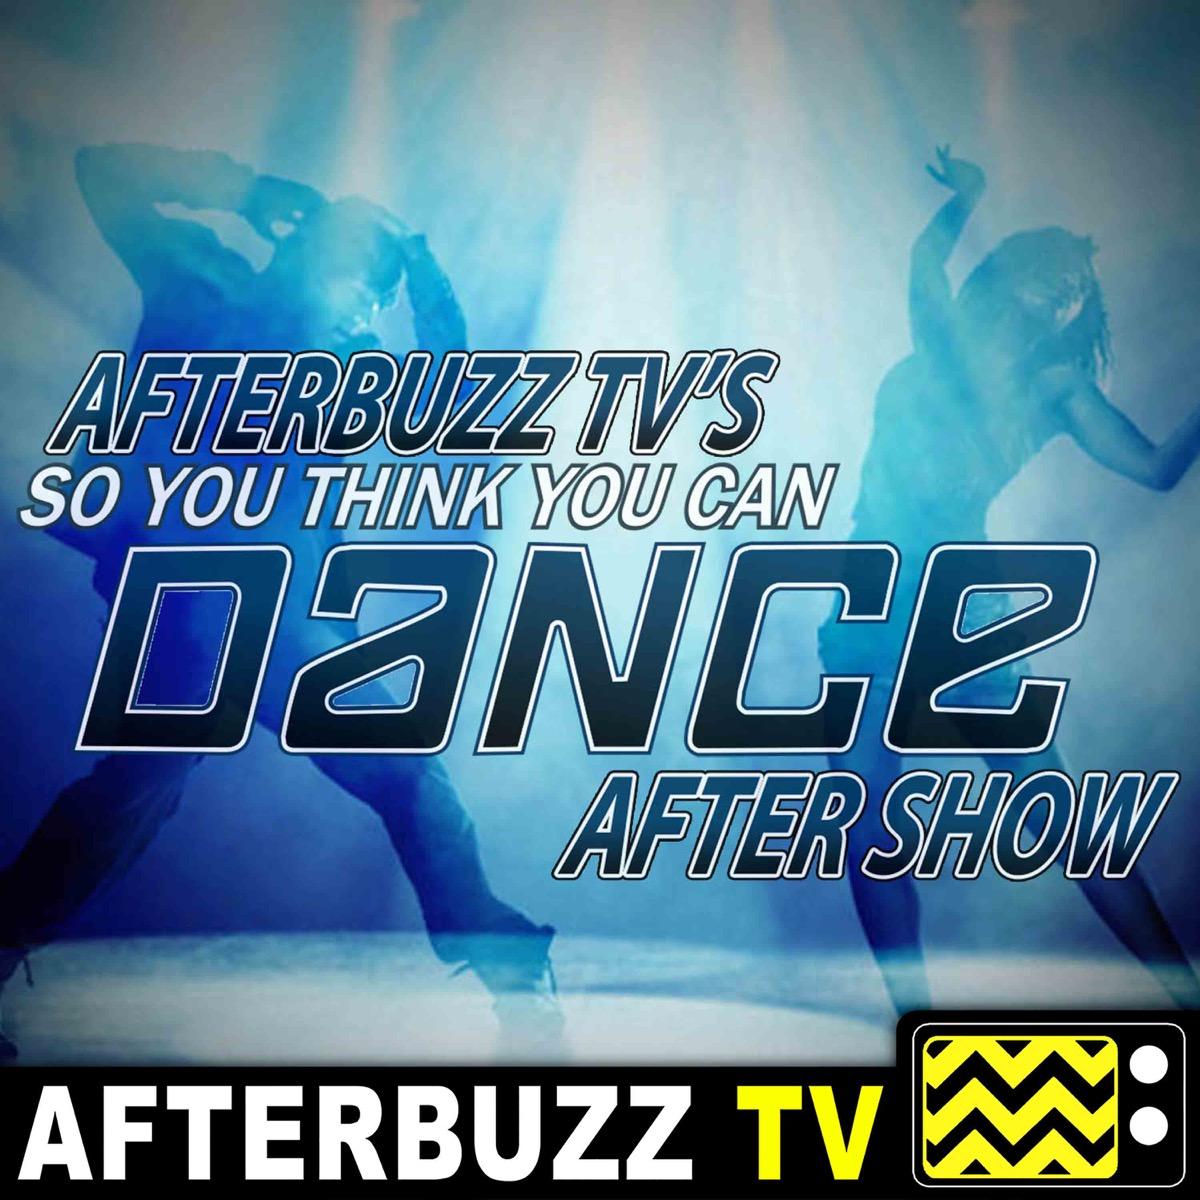 So You Think You Can Dance Season 15 Episodes 11 & 12 ...